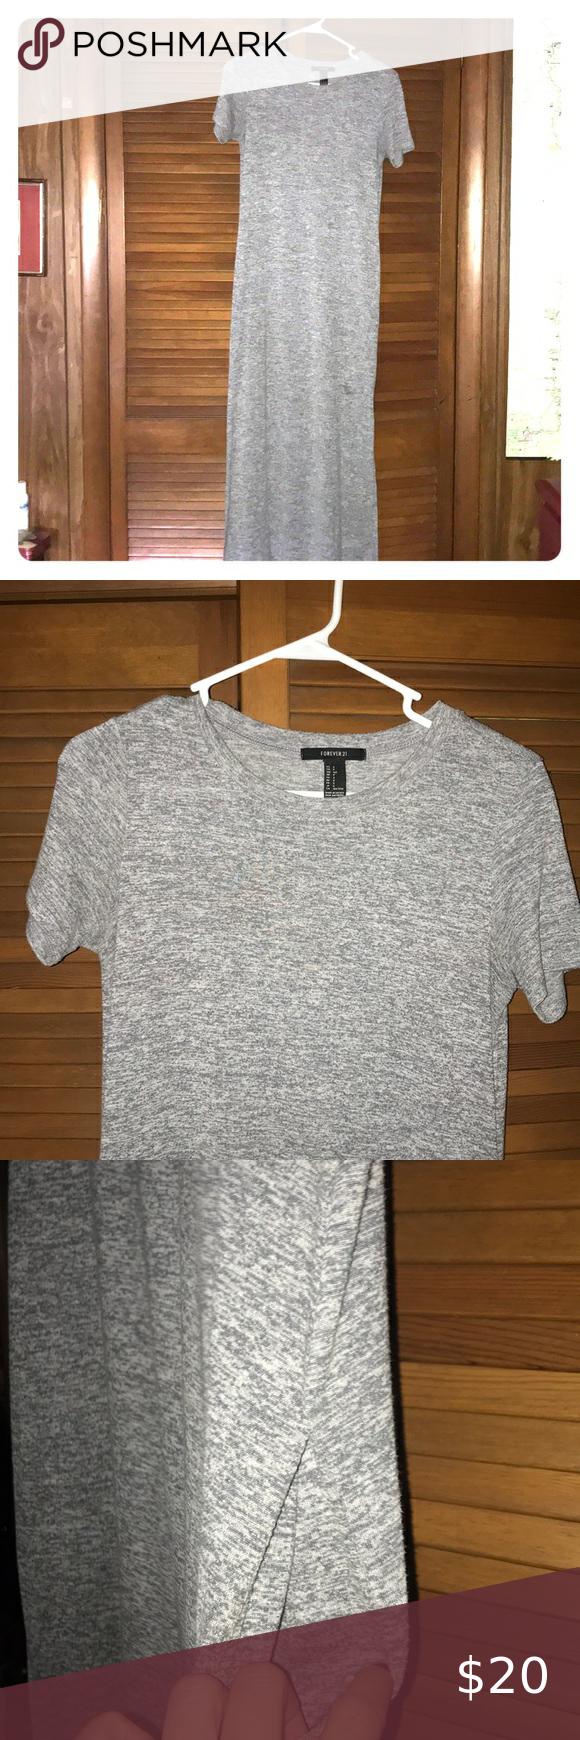 T Shirt Maxi Dress With Pockets Maxi Shirt Dress Maxi Dress T Shirt Dress [ 1740 x 580 Pixel ]